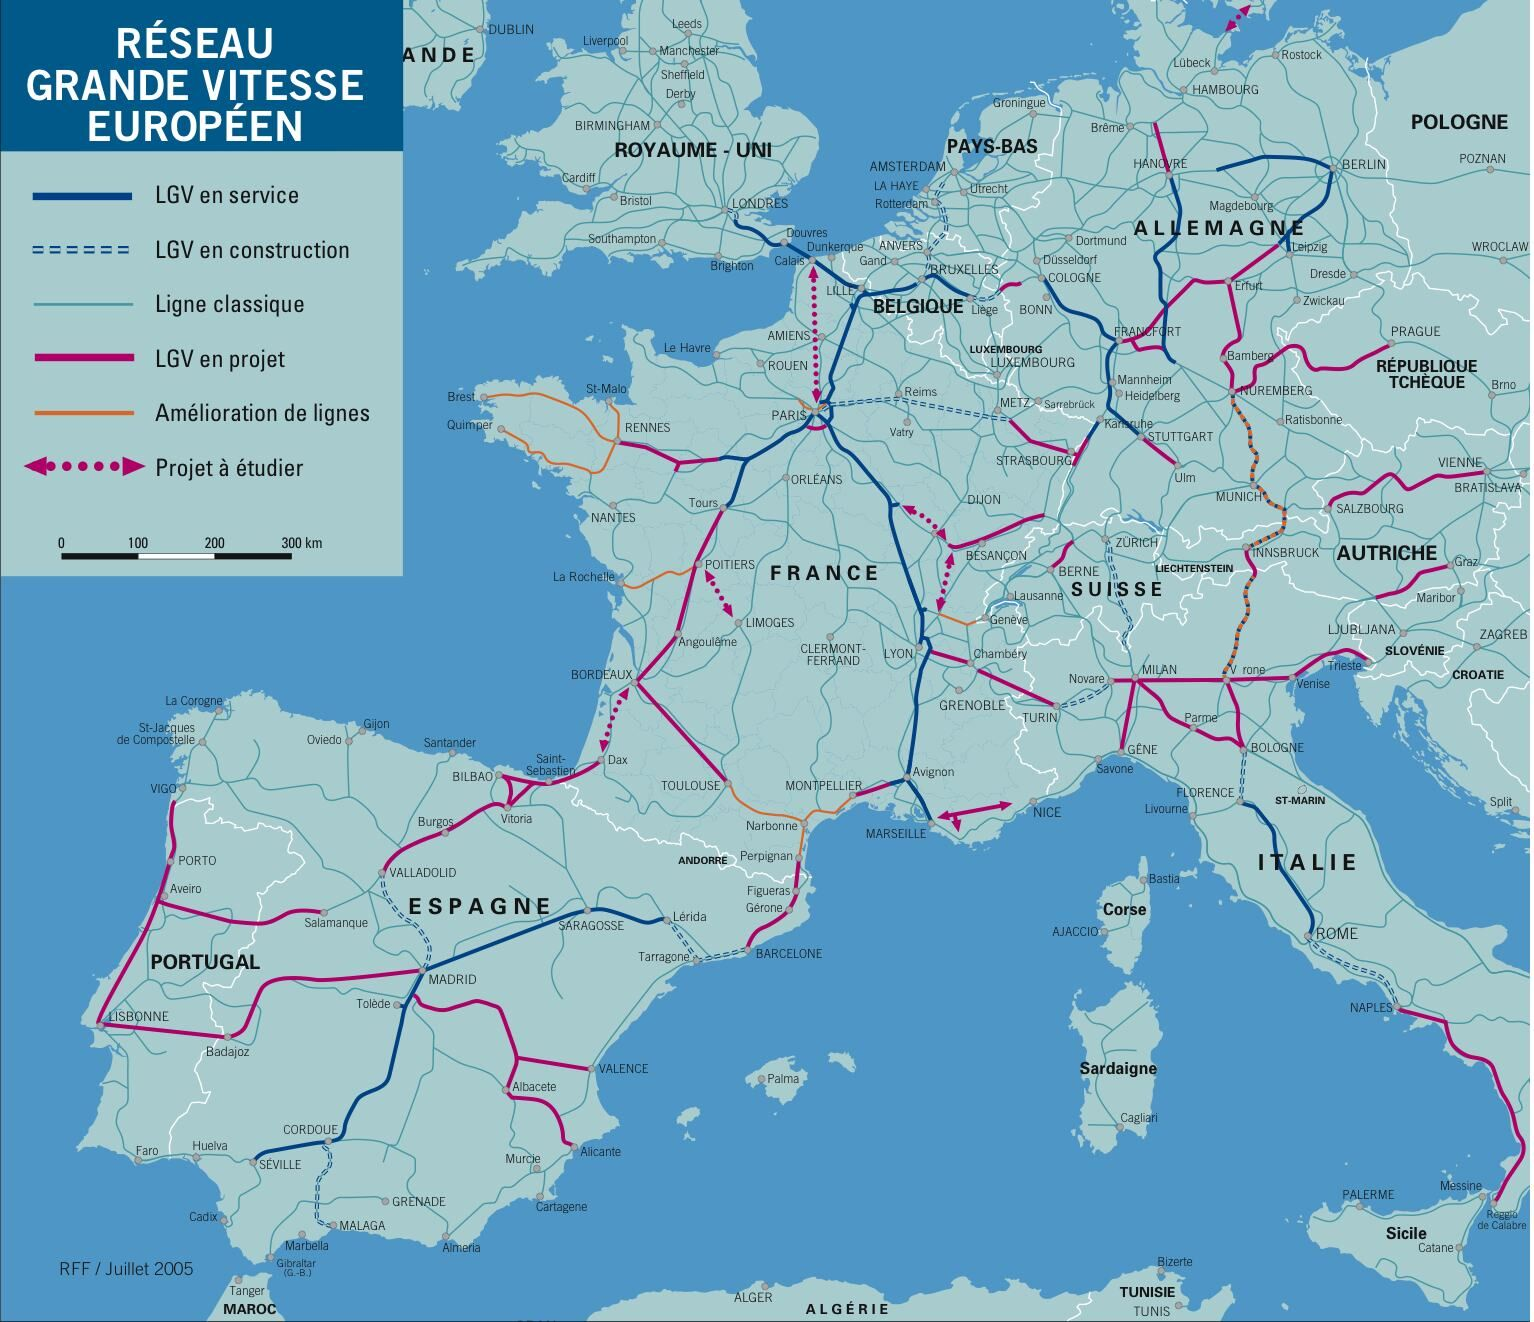 Lgv Europe Carte | tonaartsenfotografie